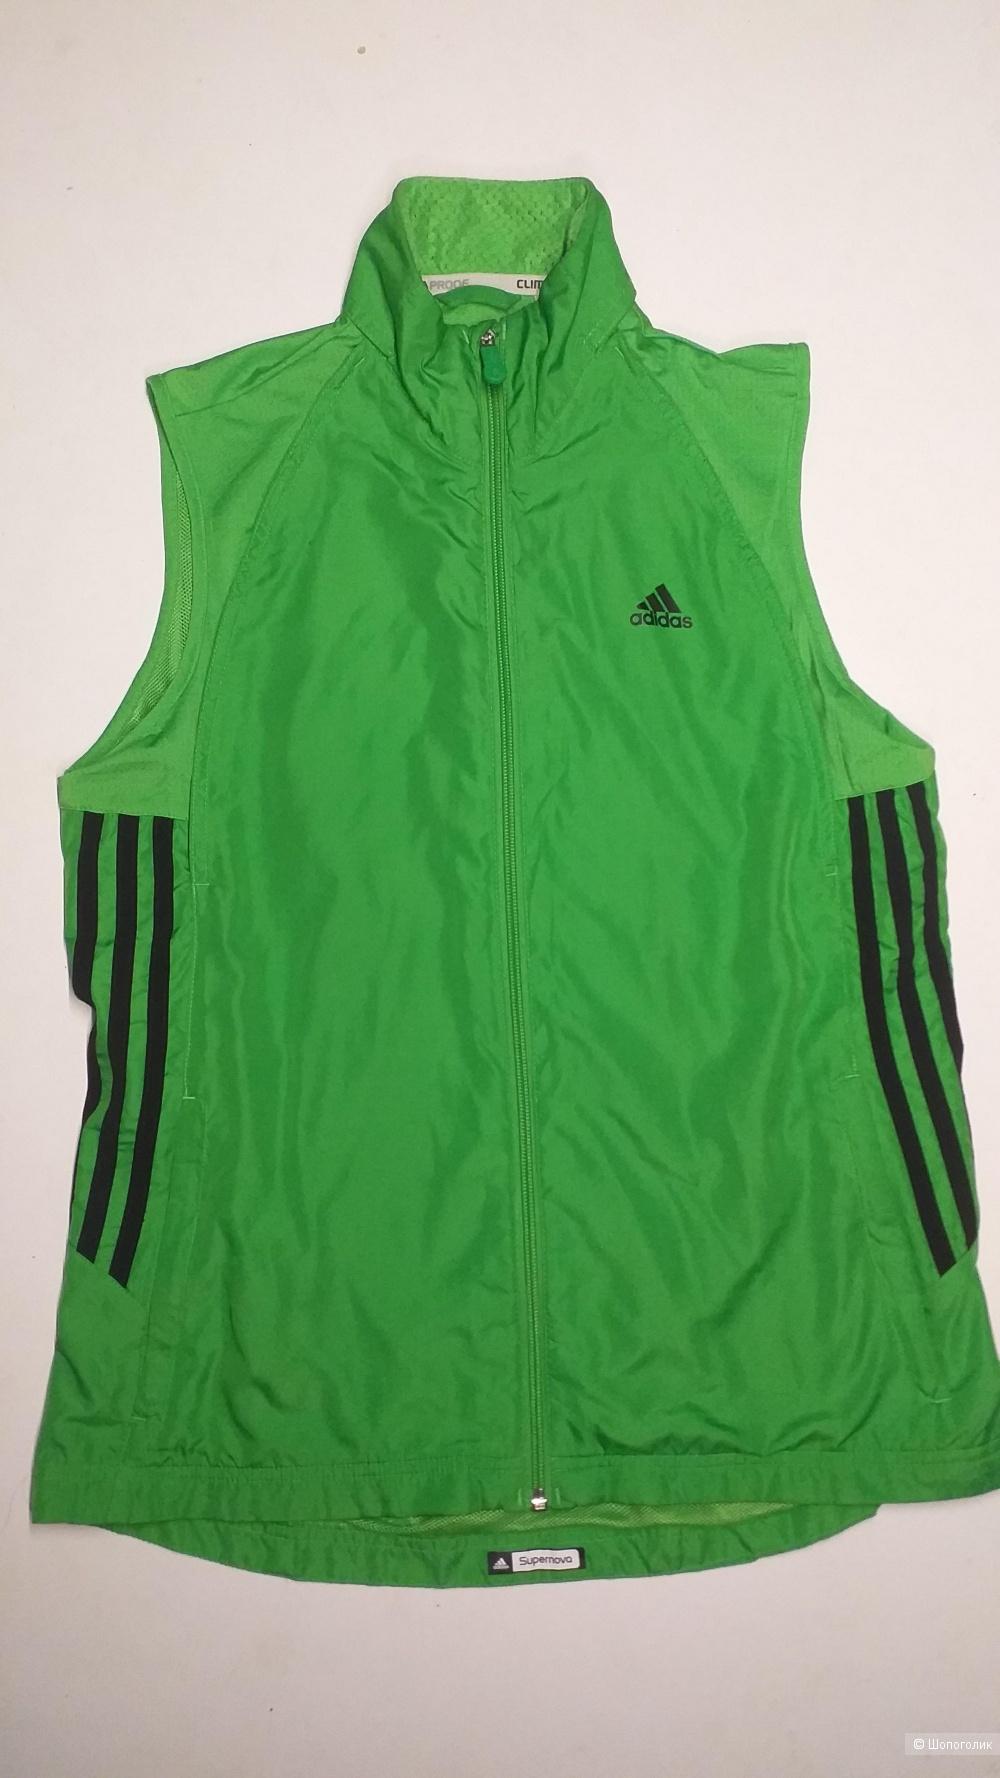 Олимпийка-трансформер и брюки Adidas, р. 44